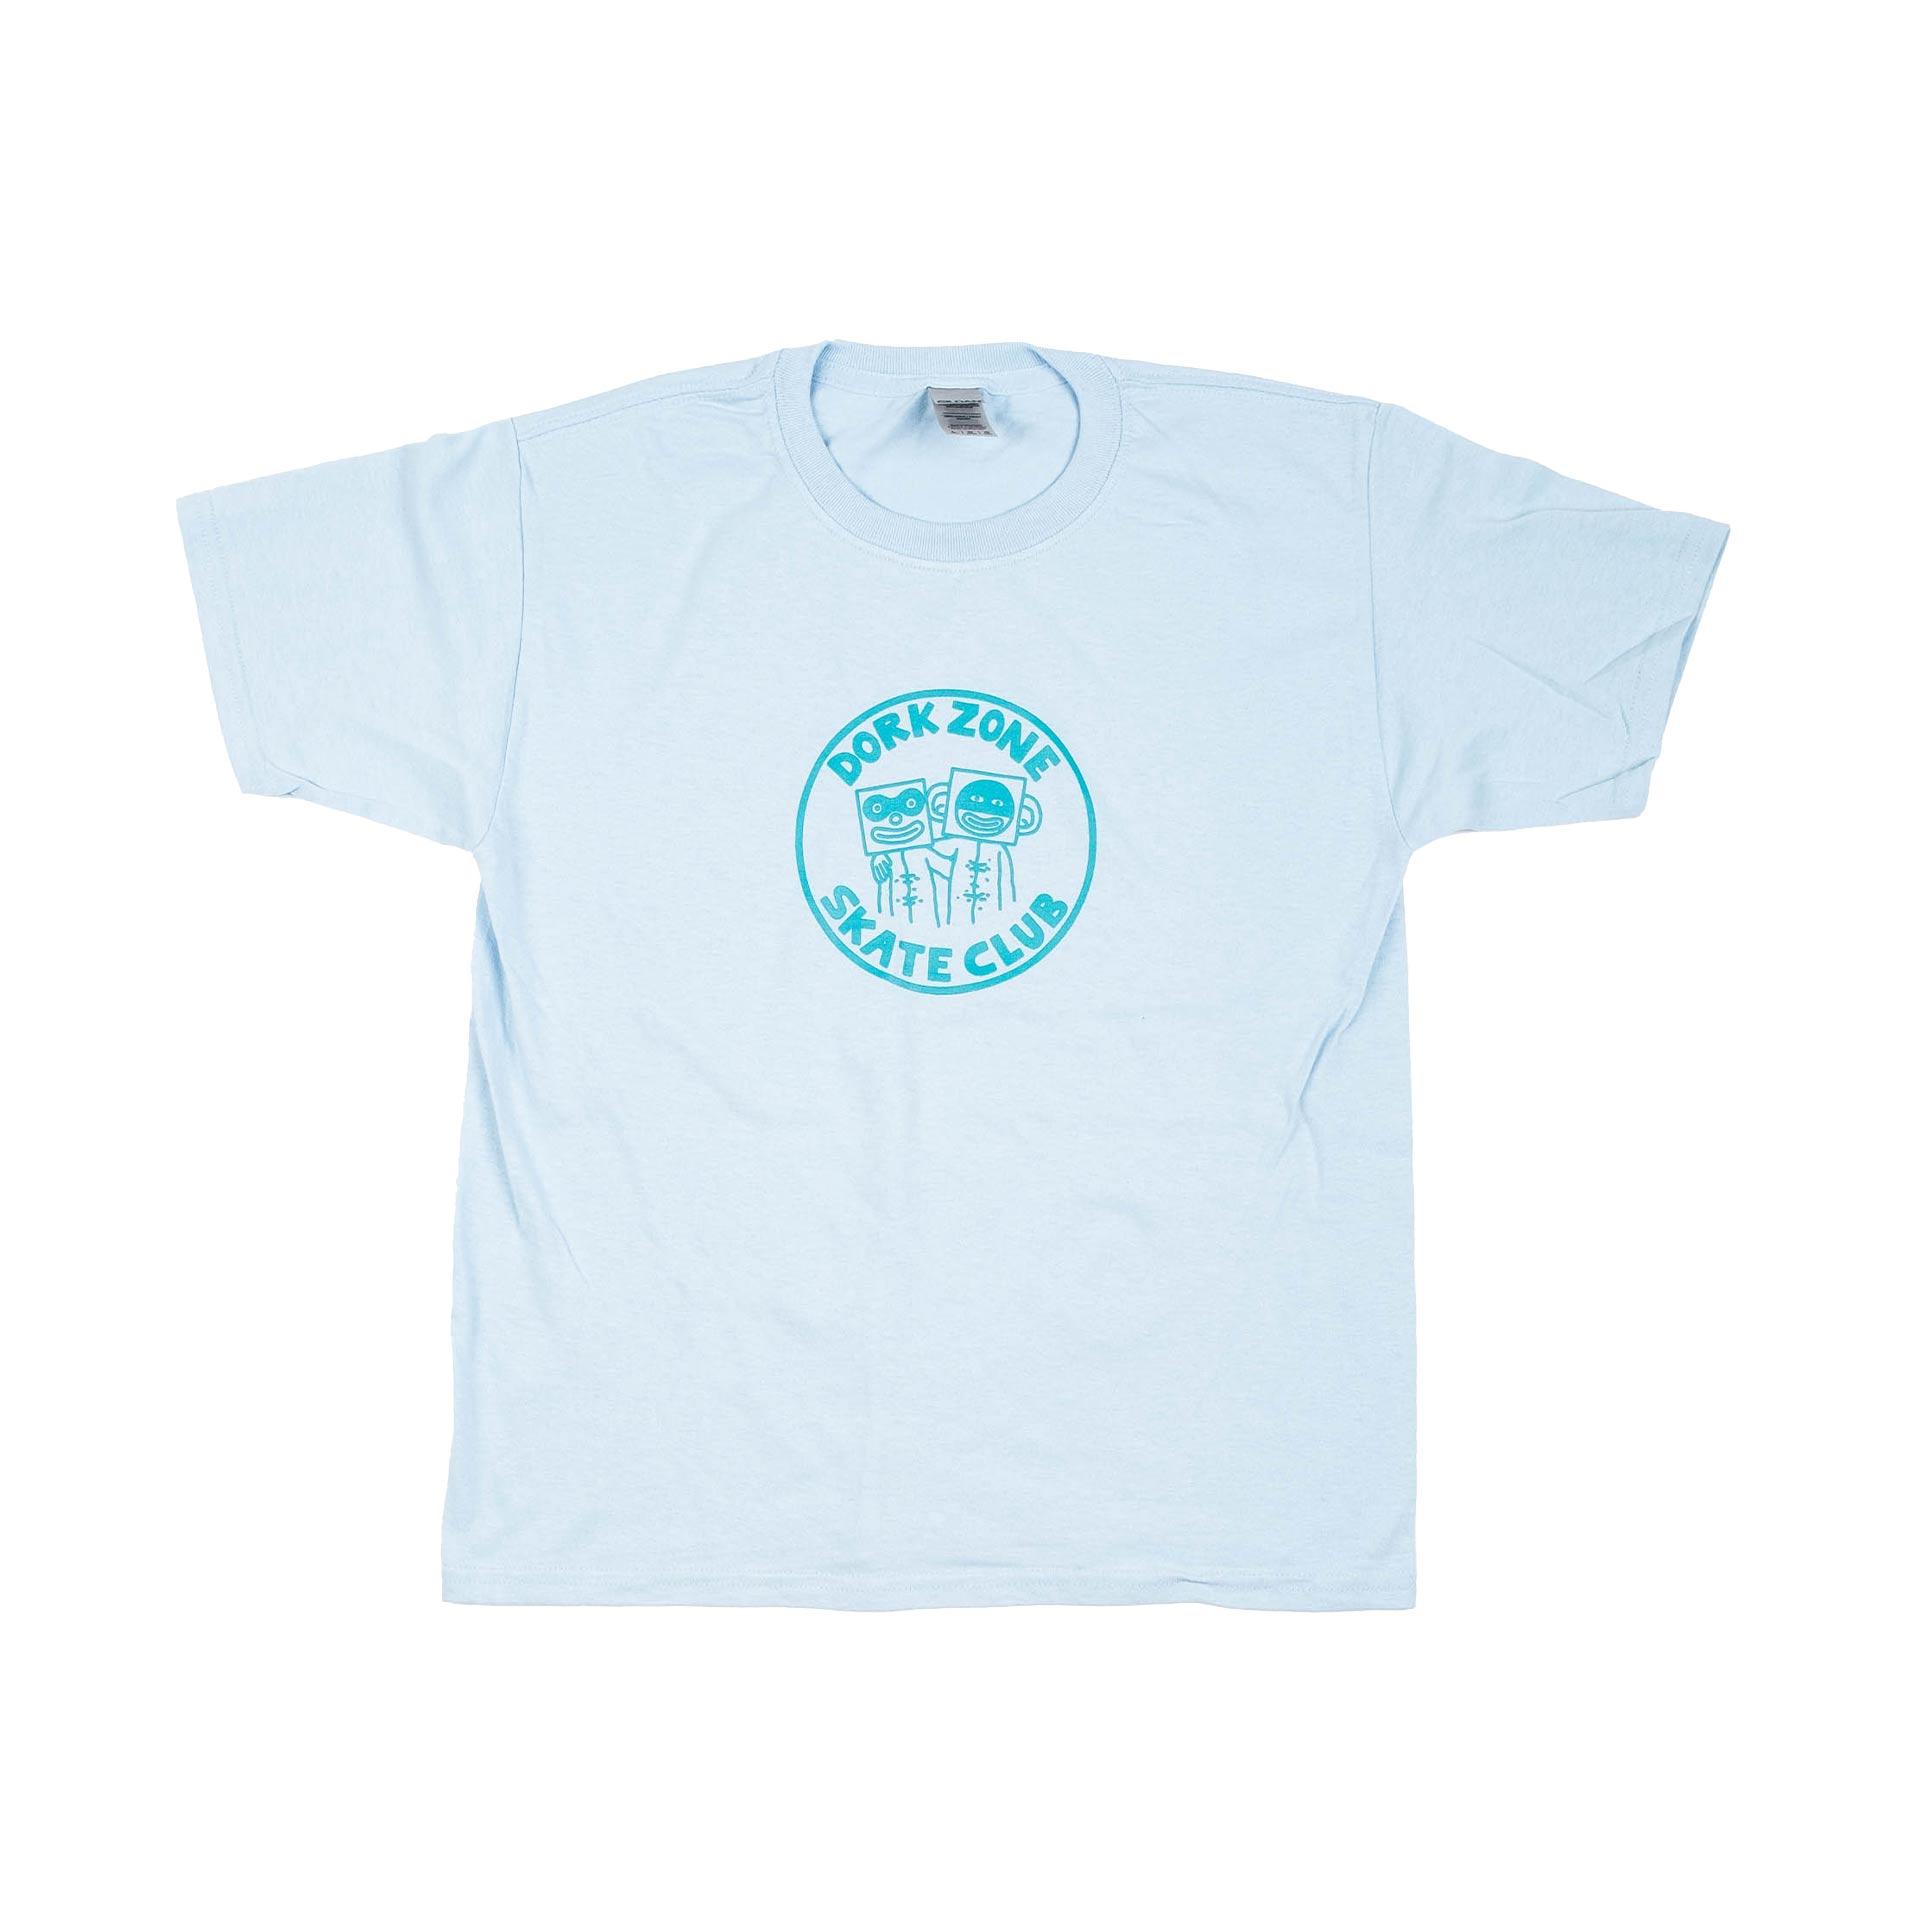 Dorkzone Skate Club Kids T-Shirt Light Blue